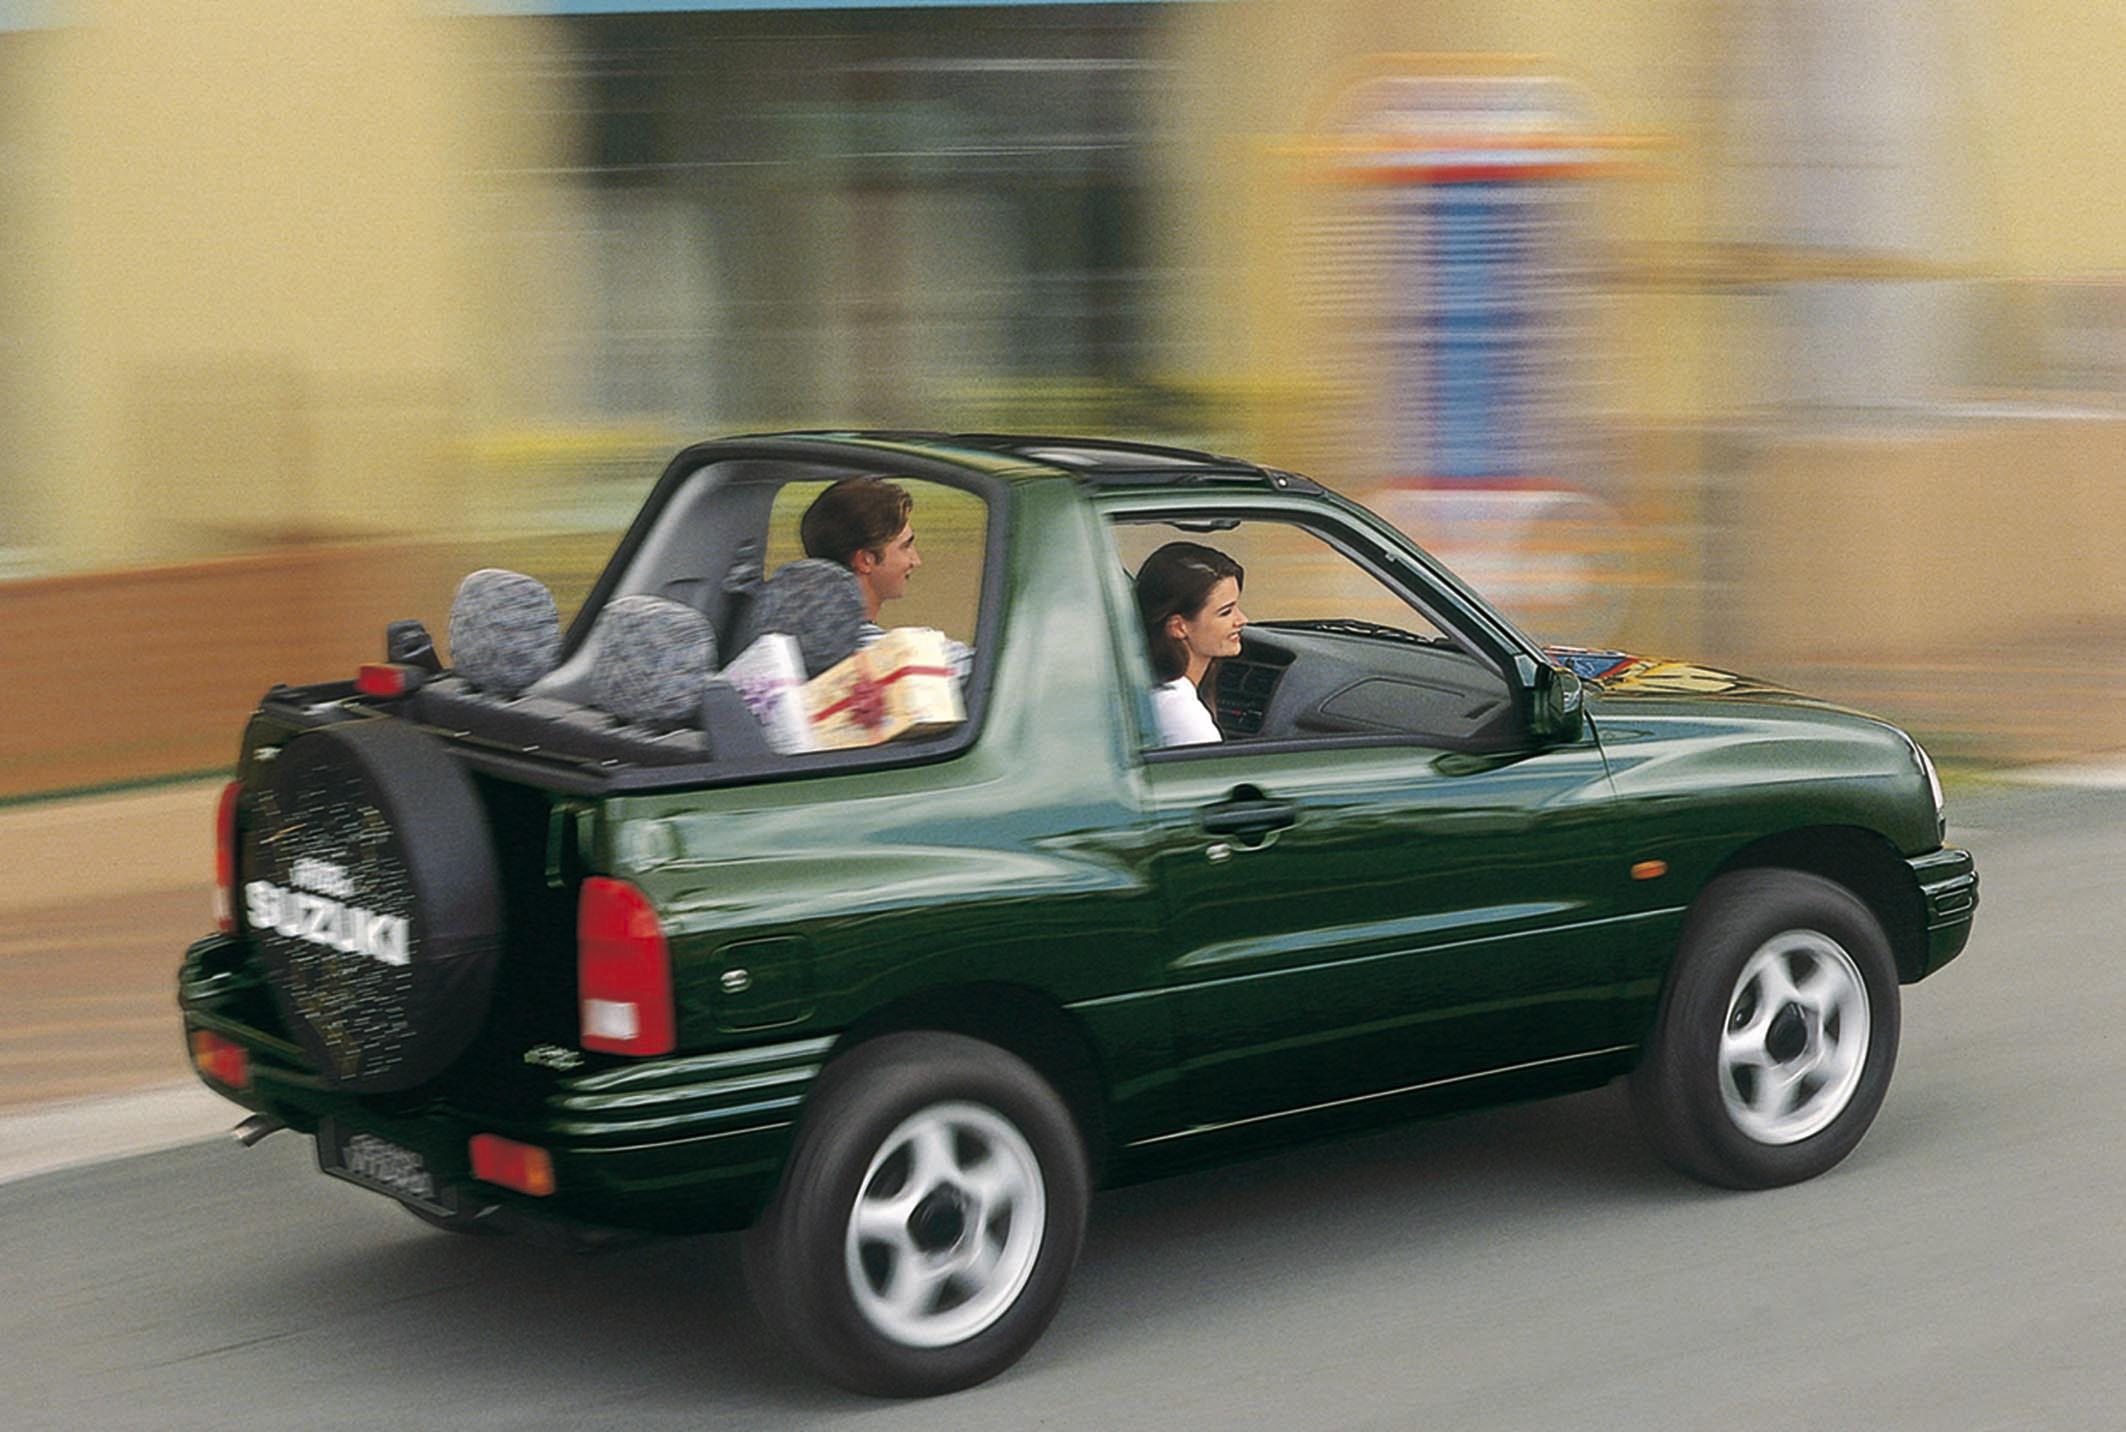 suzuki grand vitara donn es techniques des voitures sp cifications de voiture renseignements. Black Bedroom Furniture Sets. Home Design Ideas